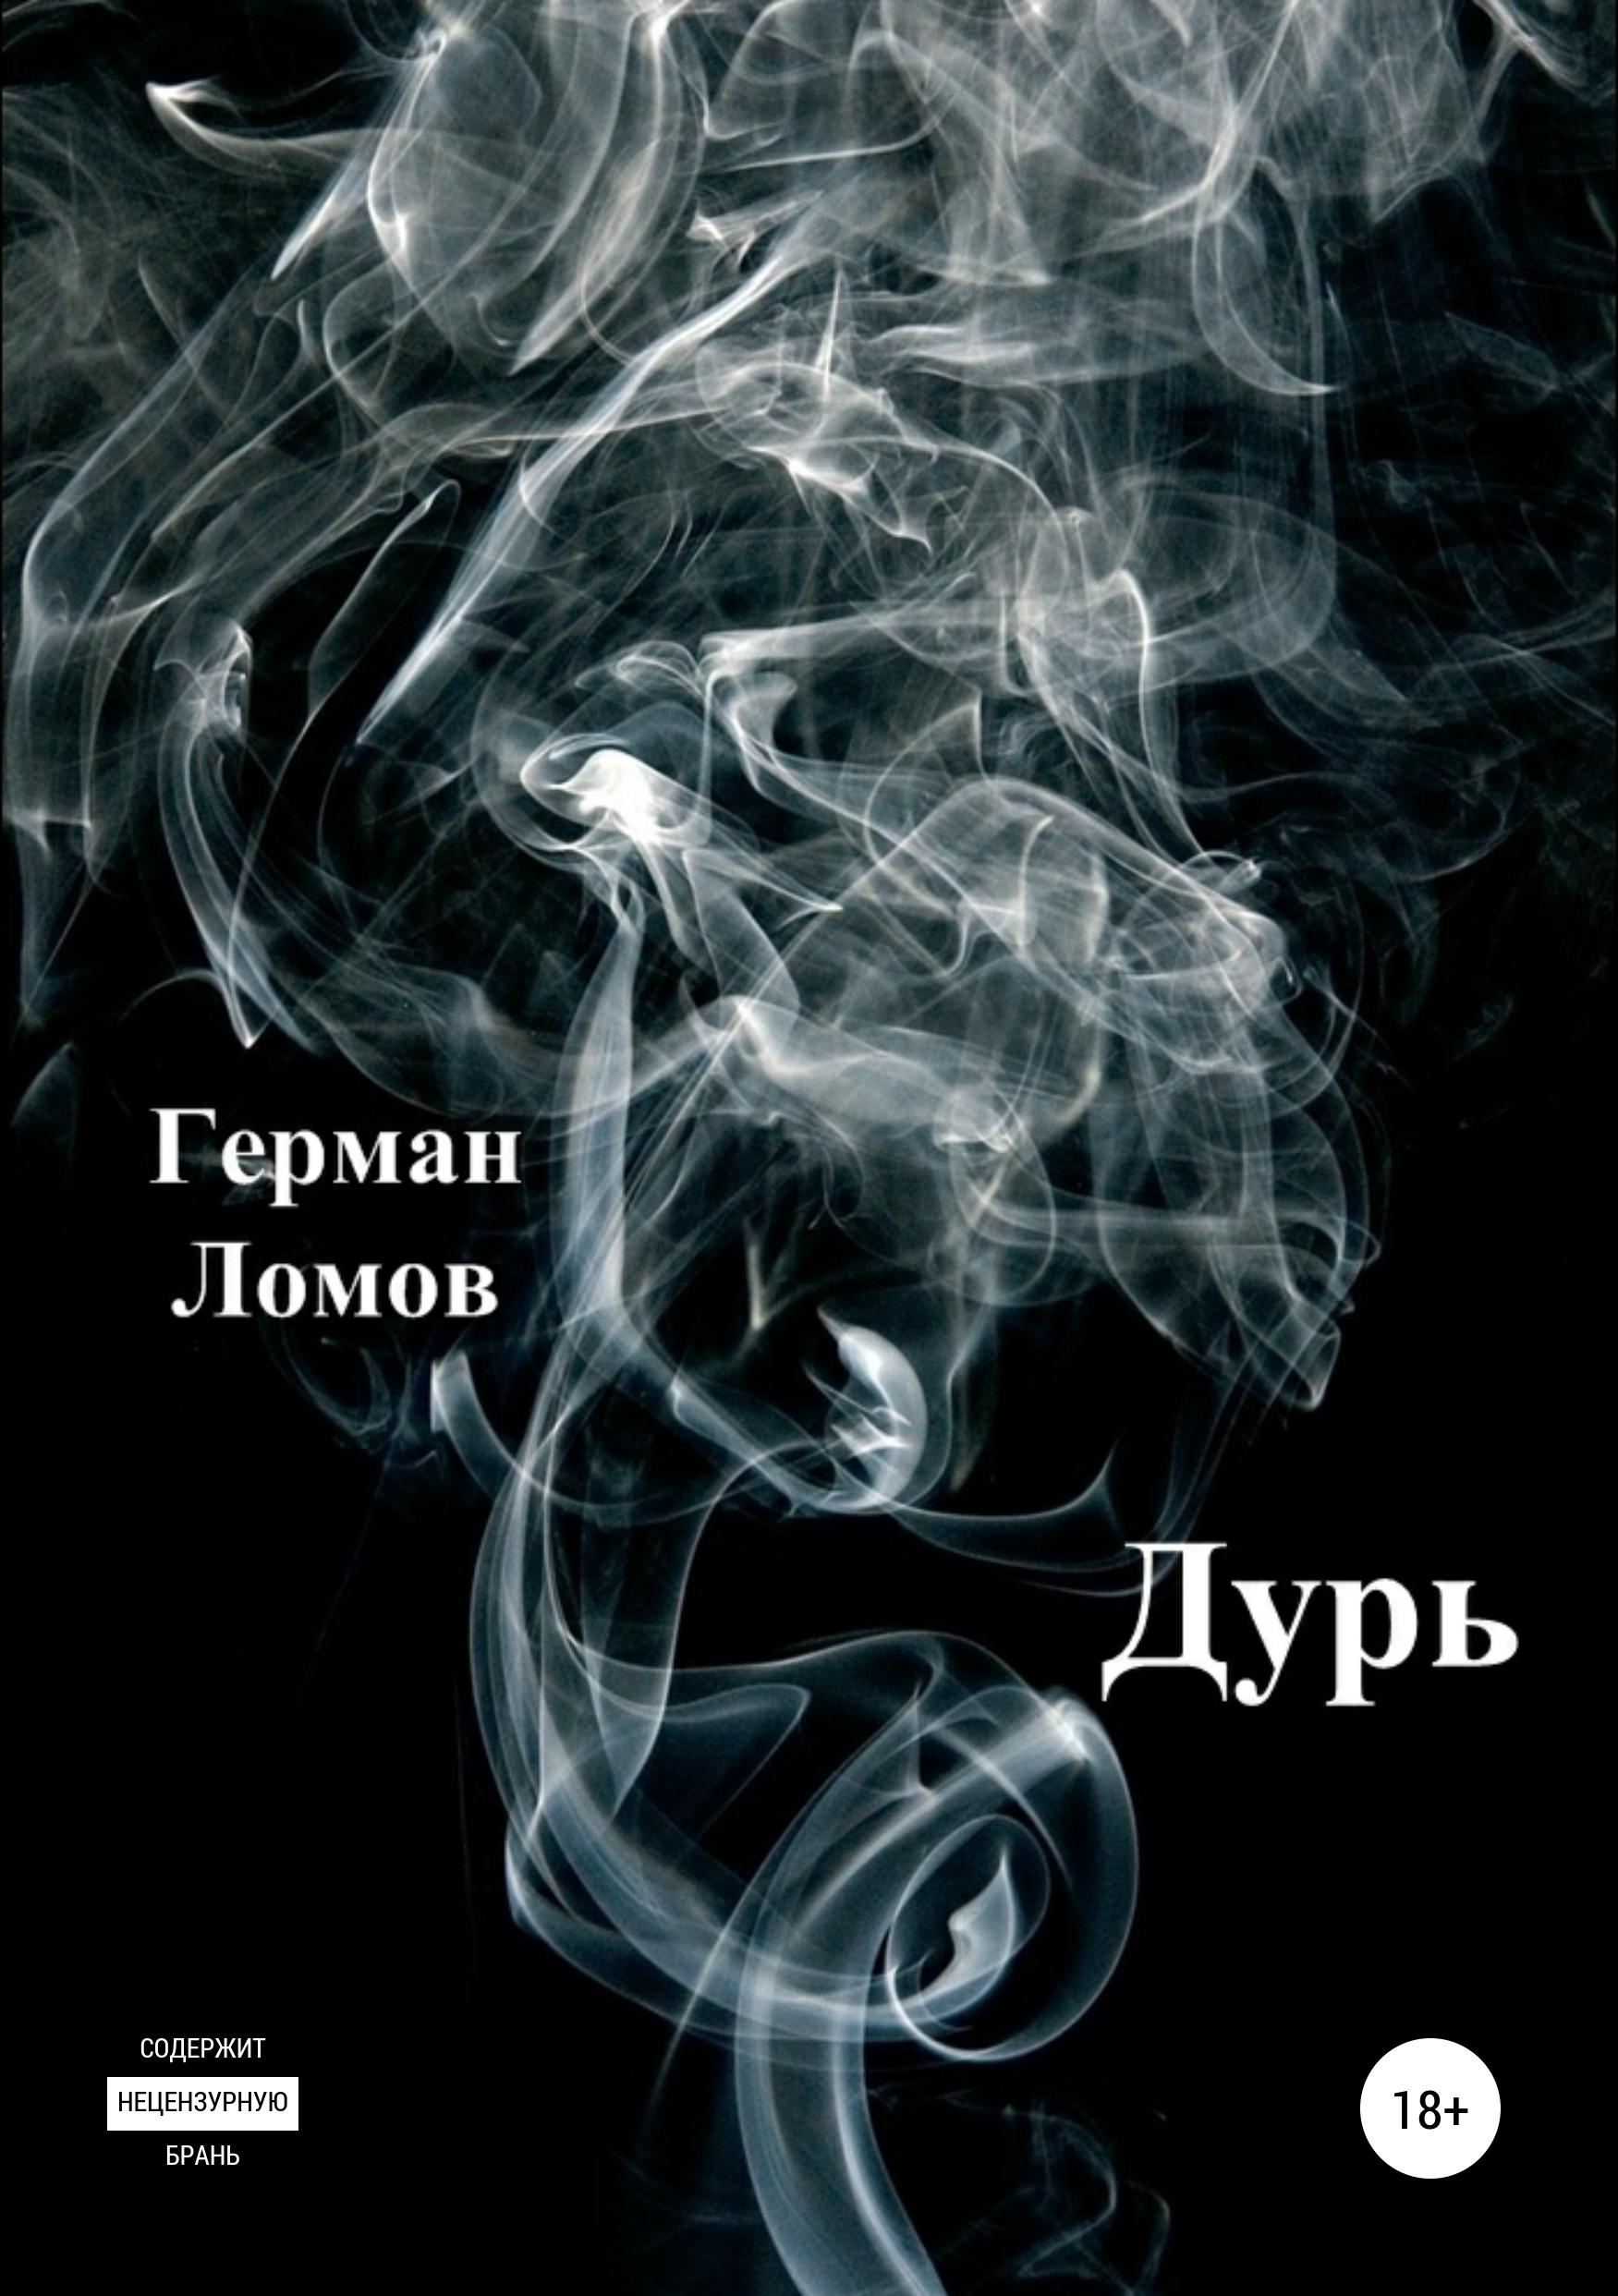 Купить книгу Дурь, автора Германа Ломова